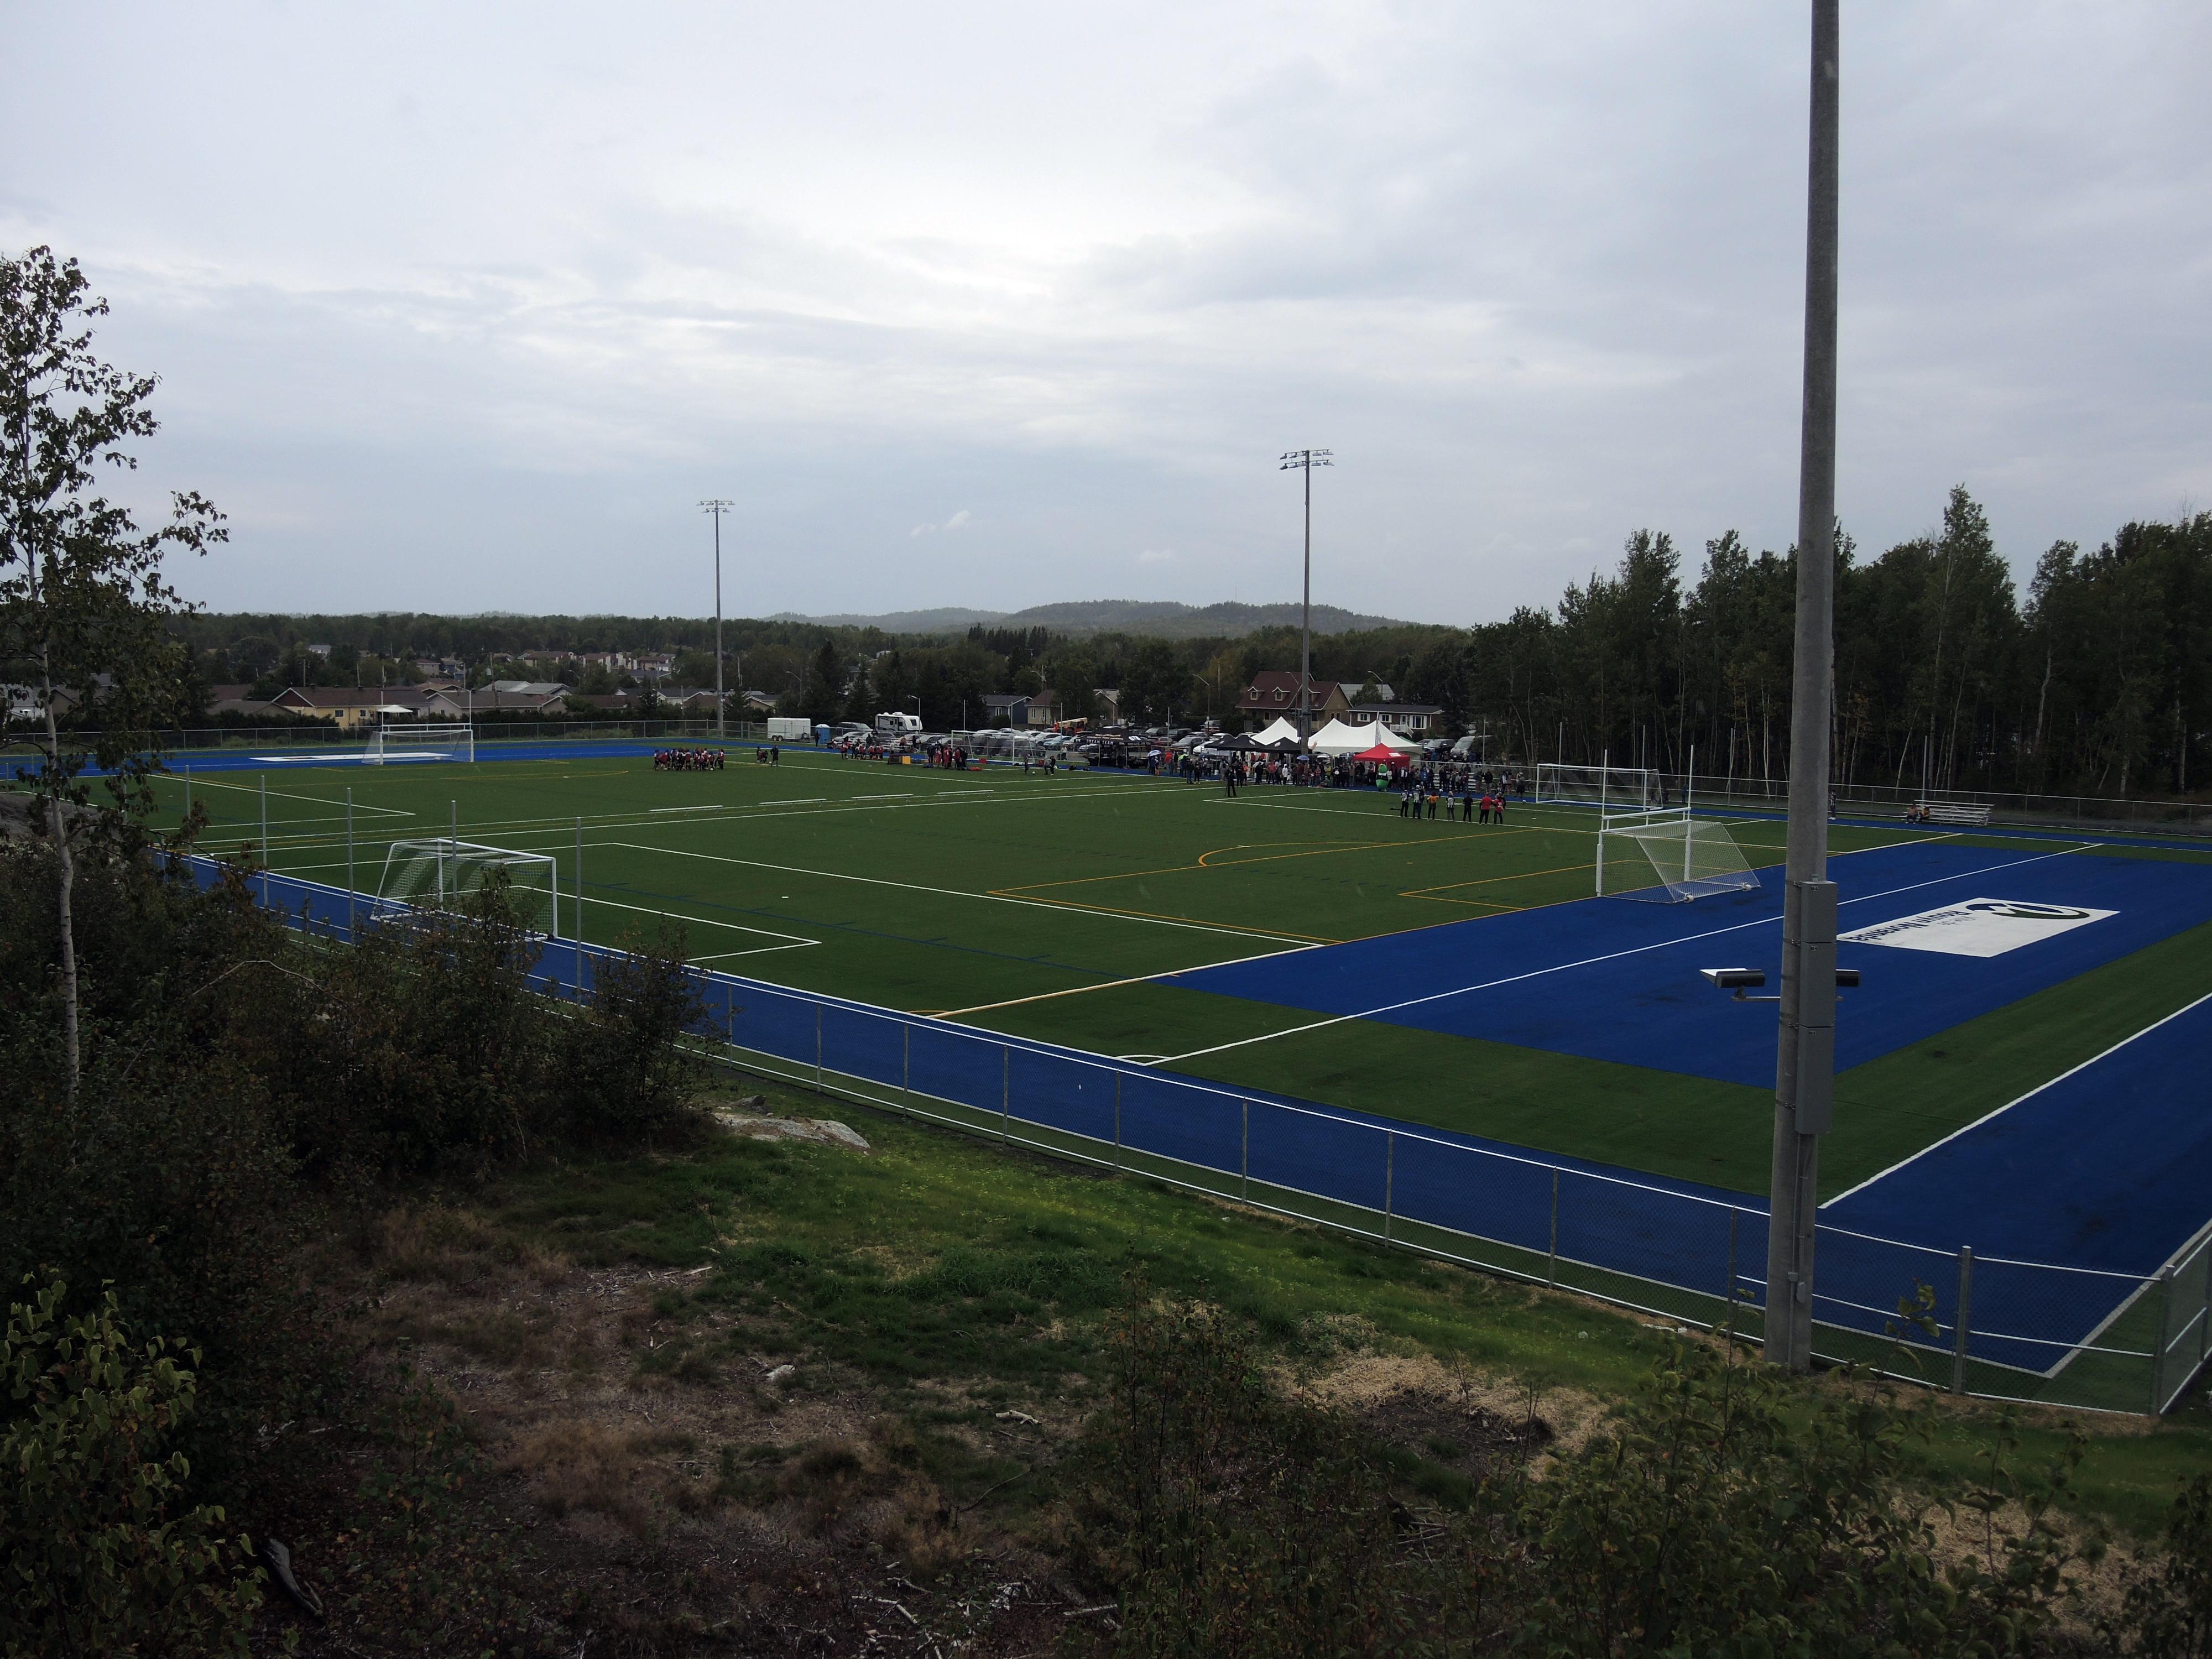 Terrains multisport St-Luc